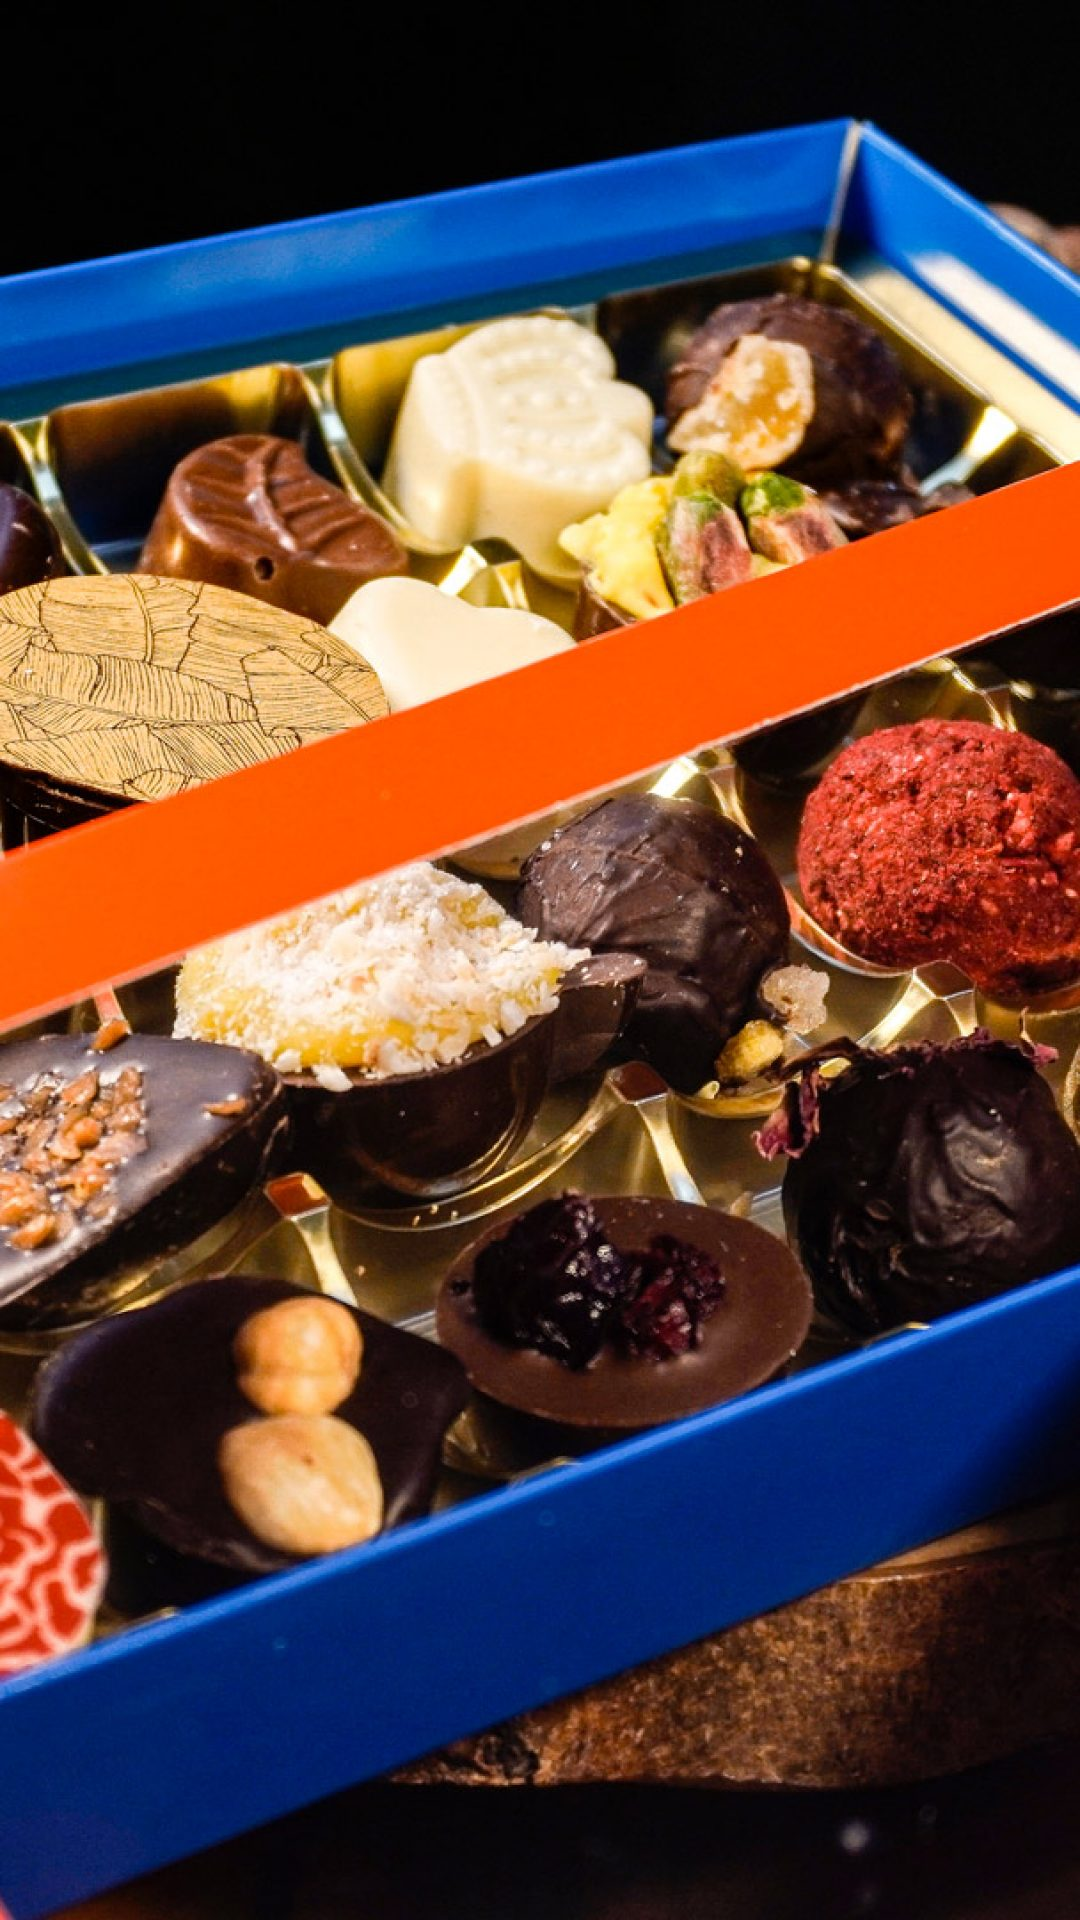 Chocolates by Cenu Cacao